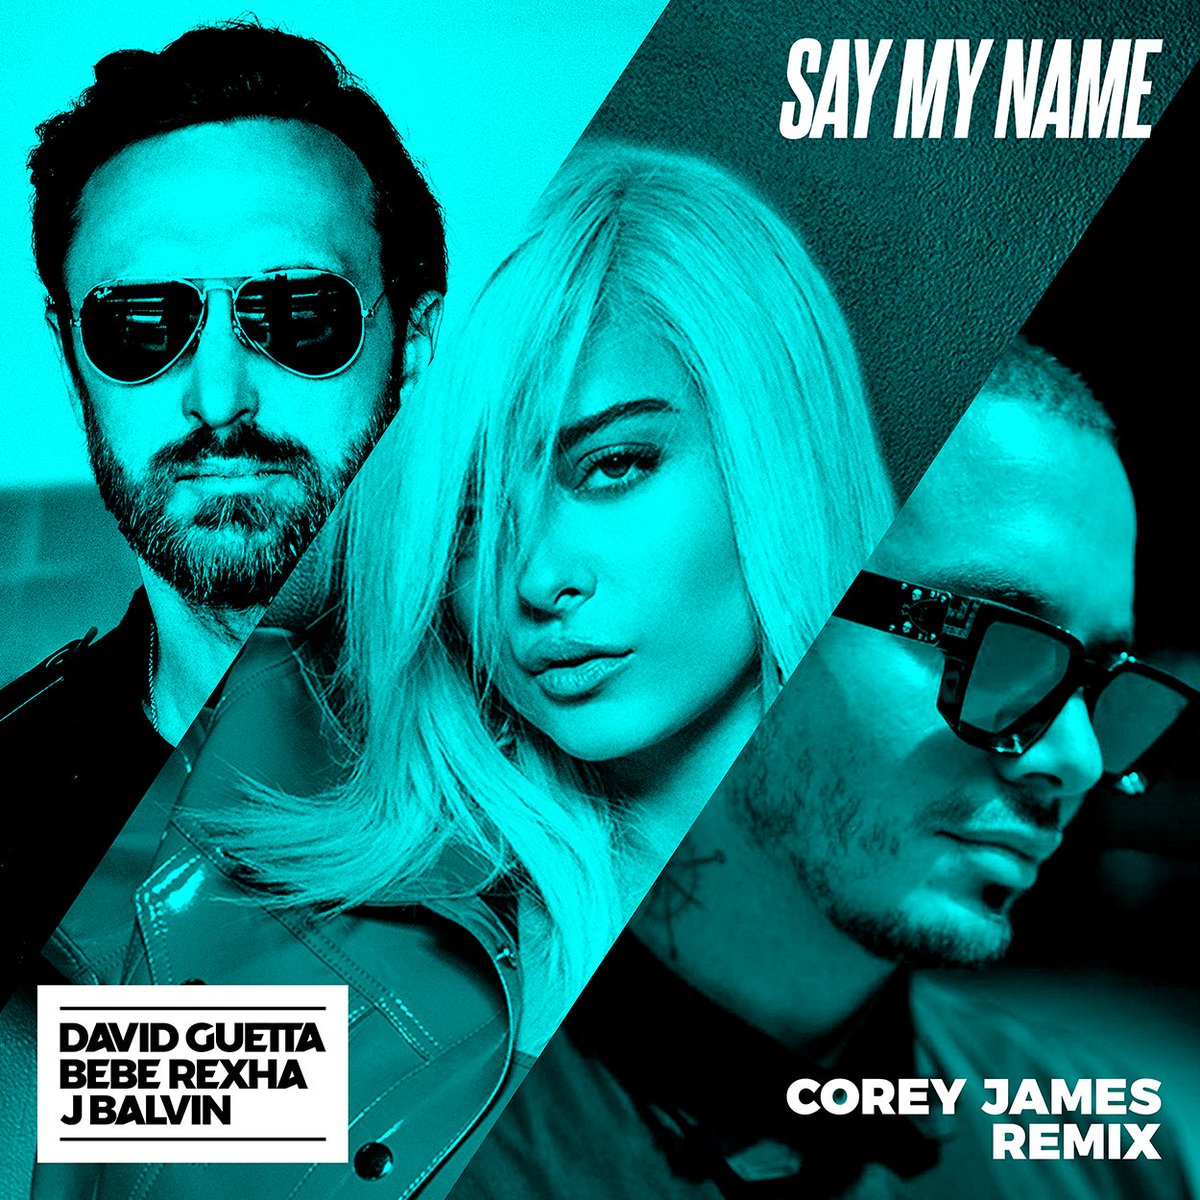 .@DavidGuetta nous offre un nouveau remix de son HIT #SayMyName avec @ImCoreyJames ! 💚 guetta.co/SMNCoreyJamesFA